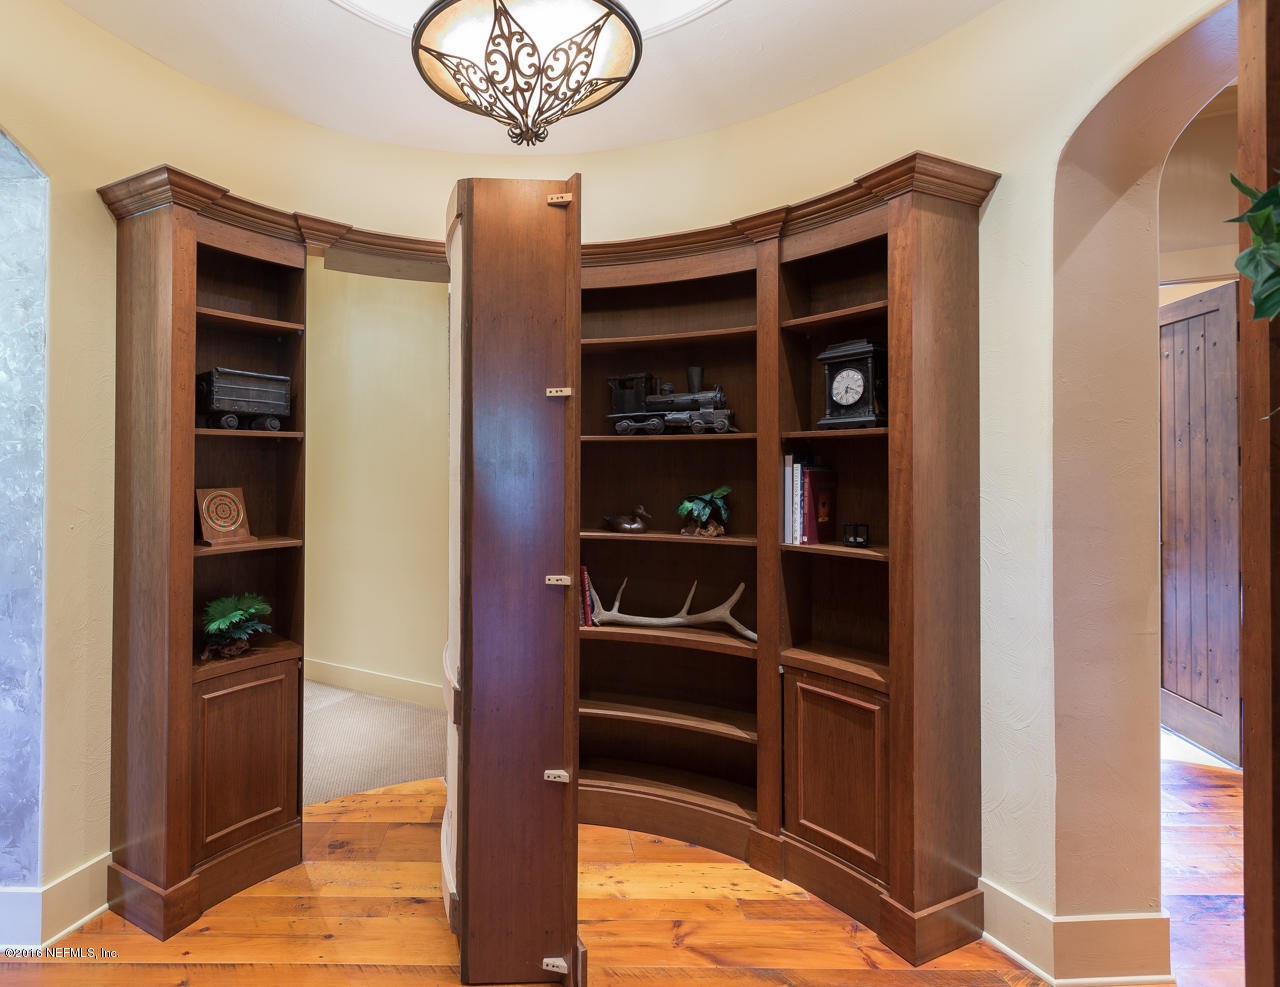 417 TRIPLE CROWN, ST JOHNS, FLORIDA 32259, 6 Bedrooms Bedrooms, ,5 BathroomsBathrooms,Residential - single family,For sale,TRIPLE CROWN,834973